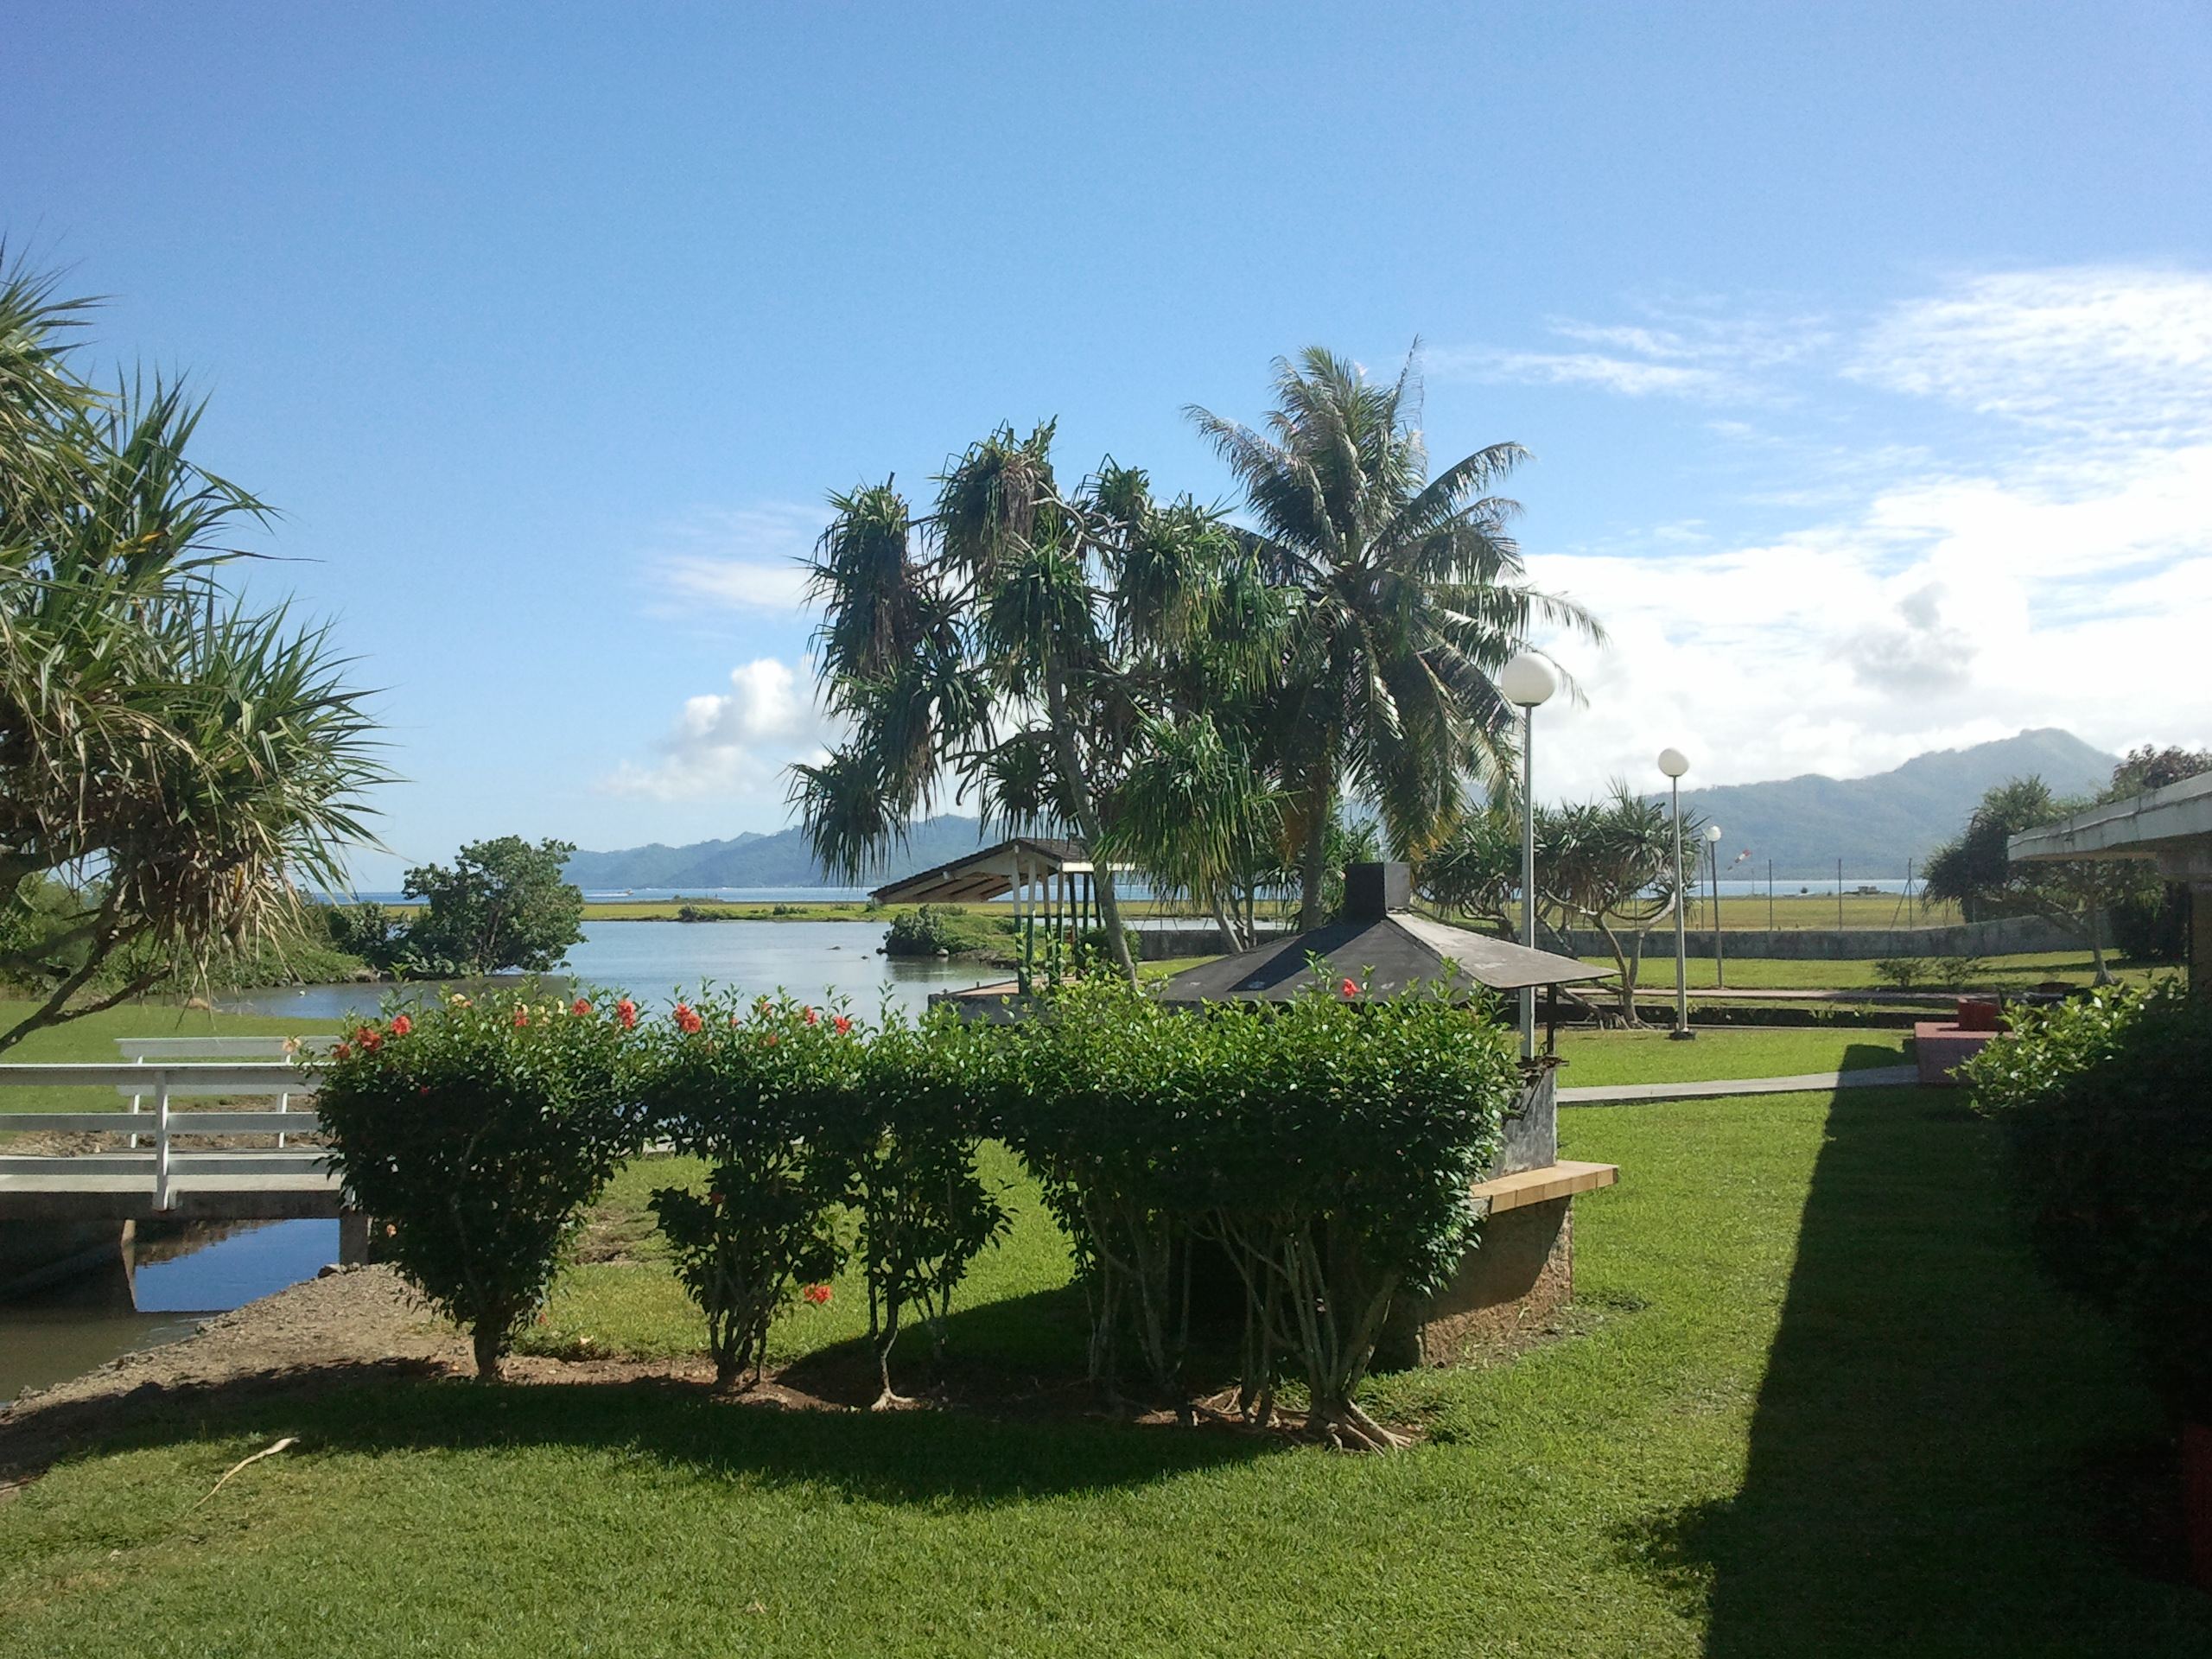 jardinier paysagiste pour un beau jardin annuaire tahiti. Black Bedroom Furniture Sets. Home Design Ideas